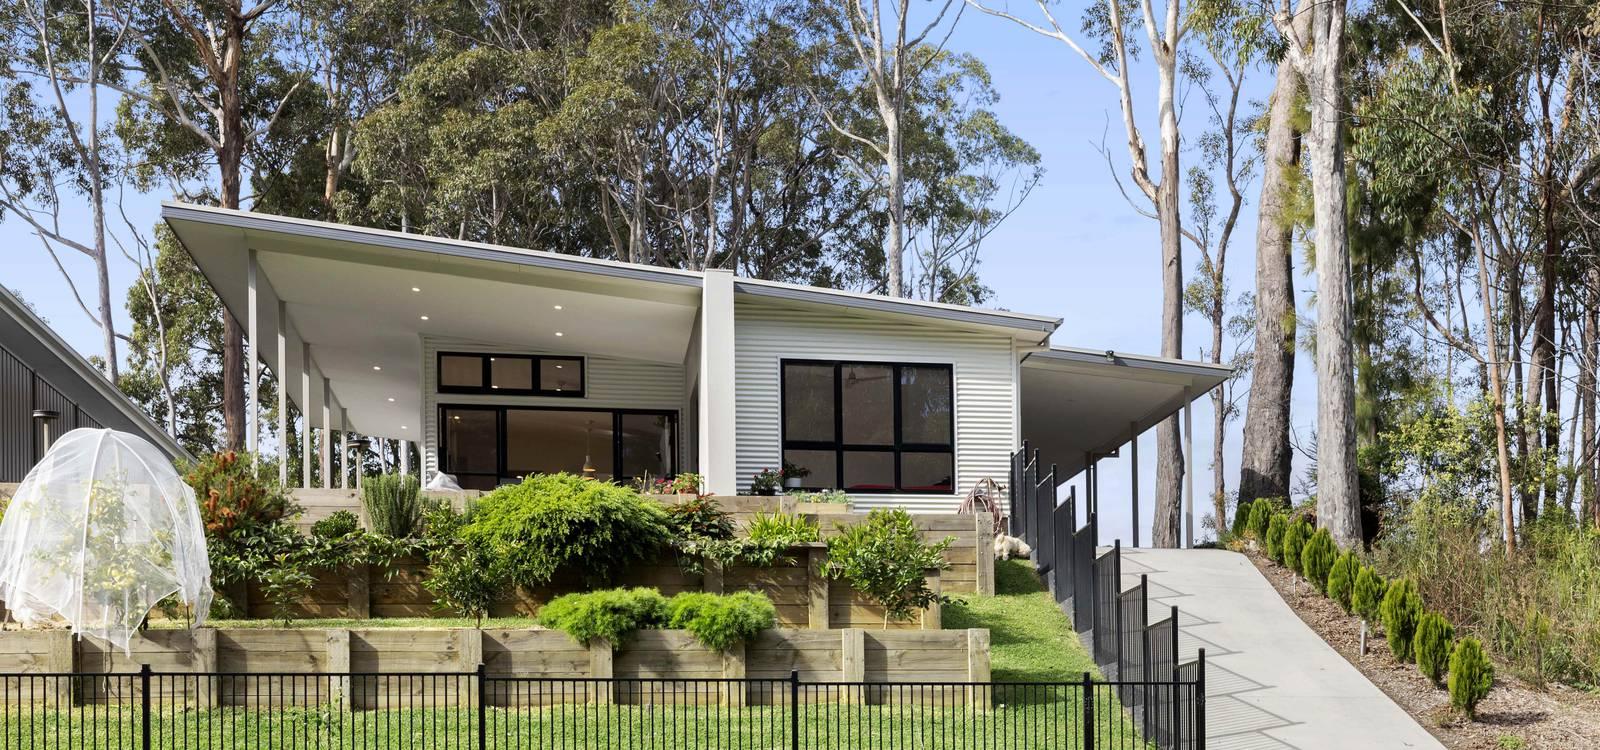 52 Litchfield Crescent LONG BEACH, NSW 2536 - photo 1